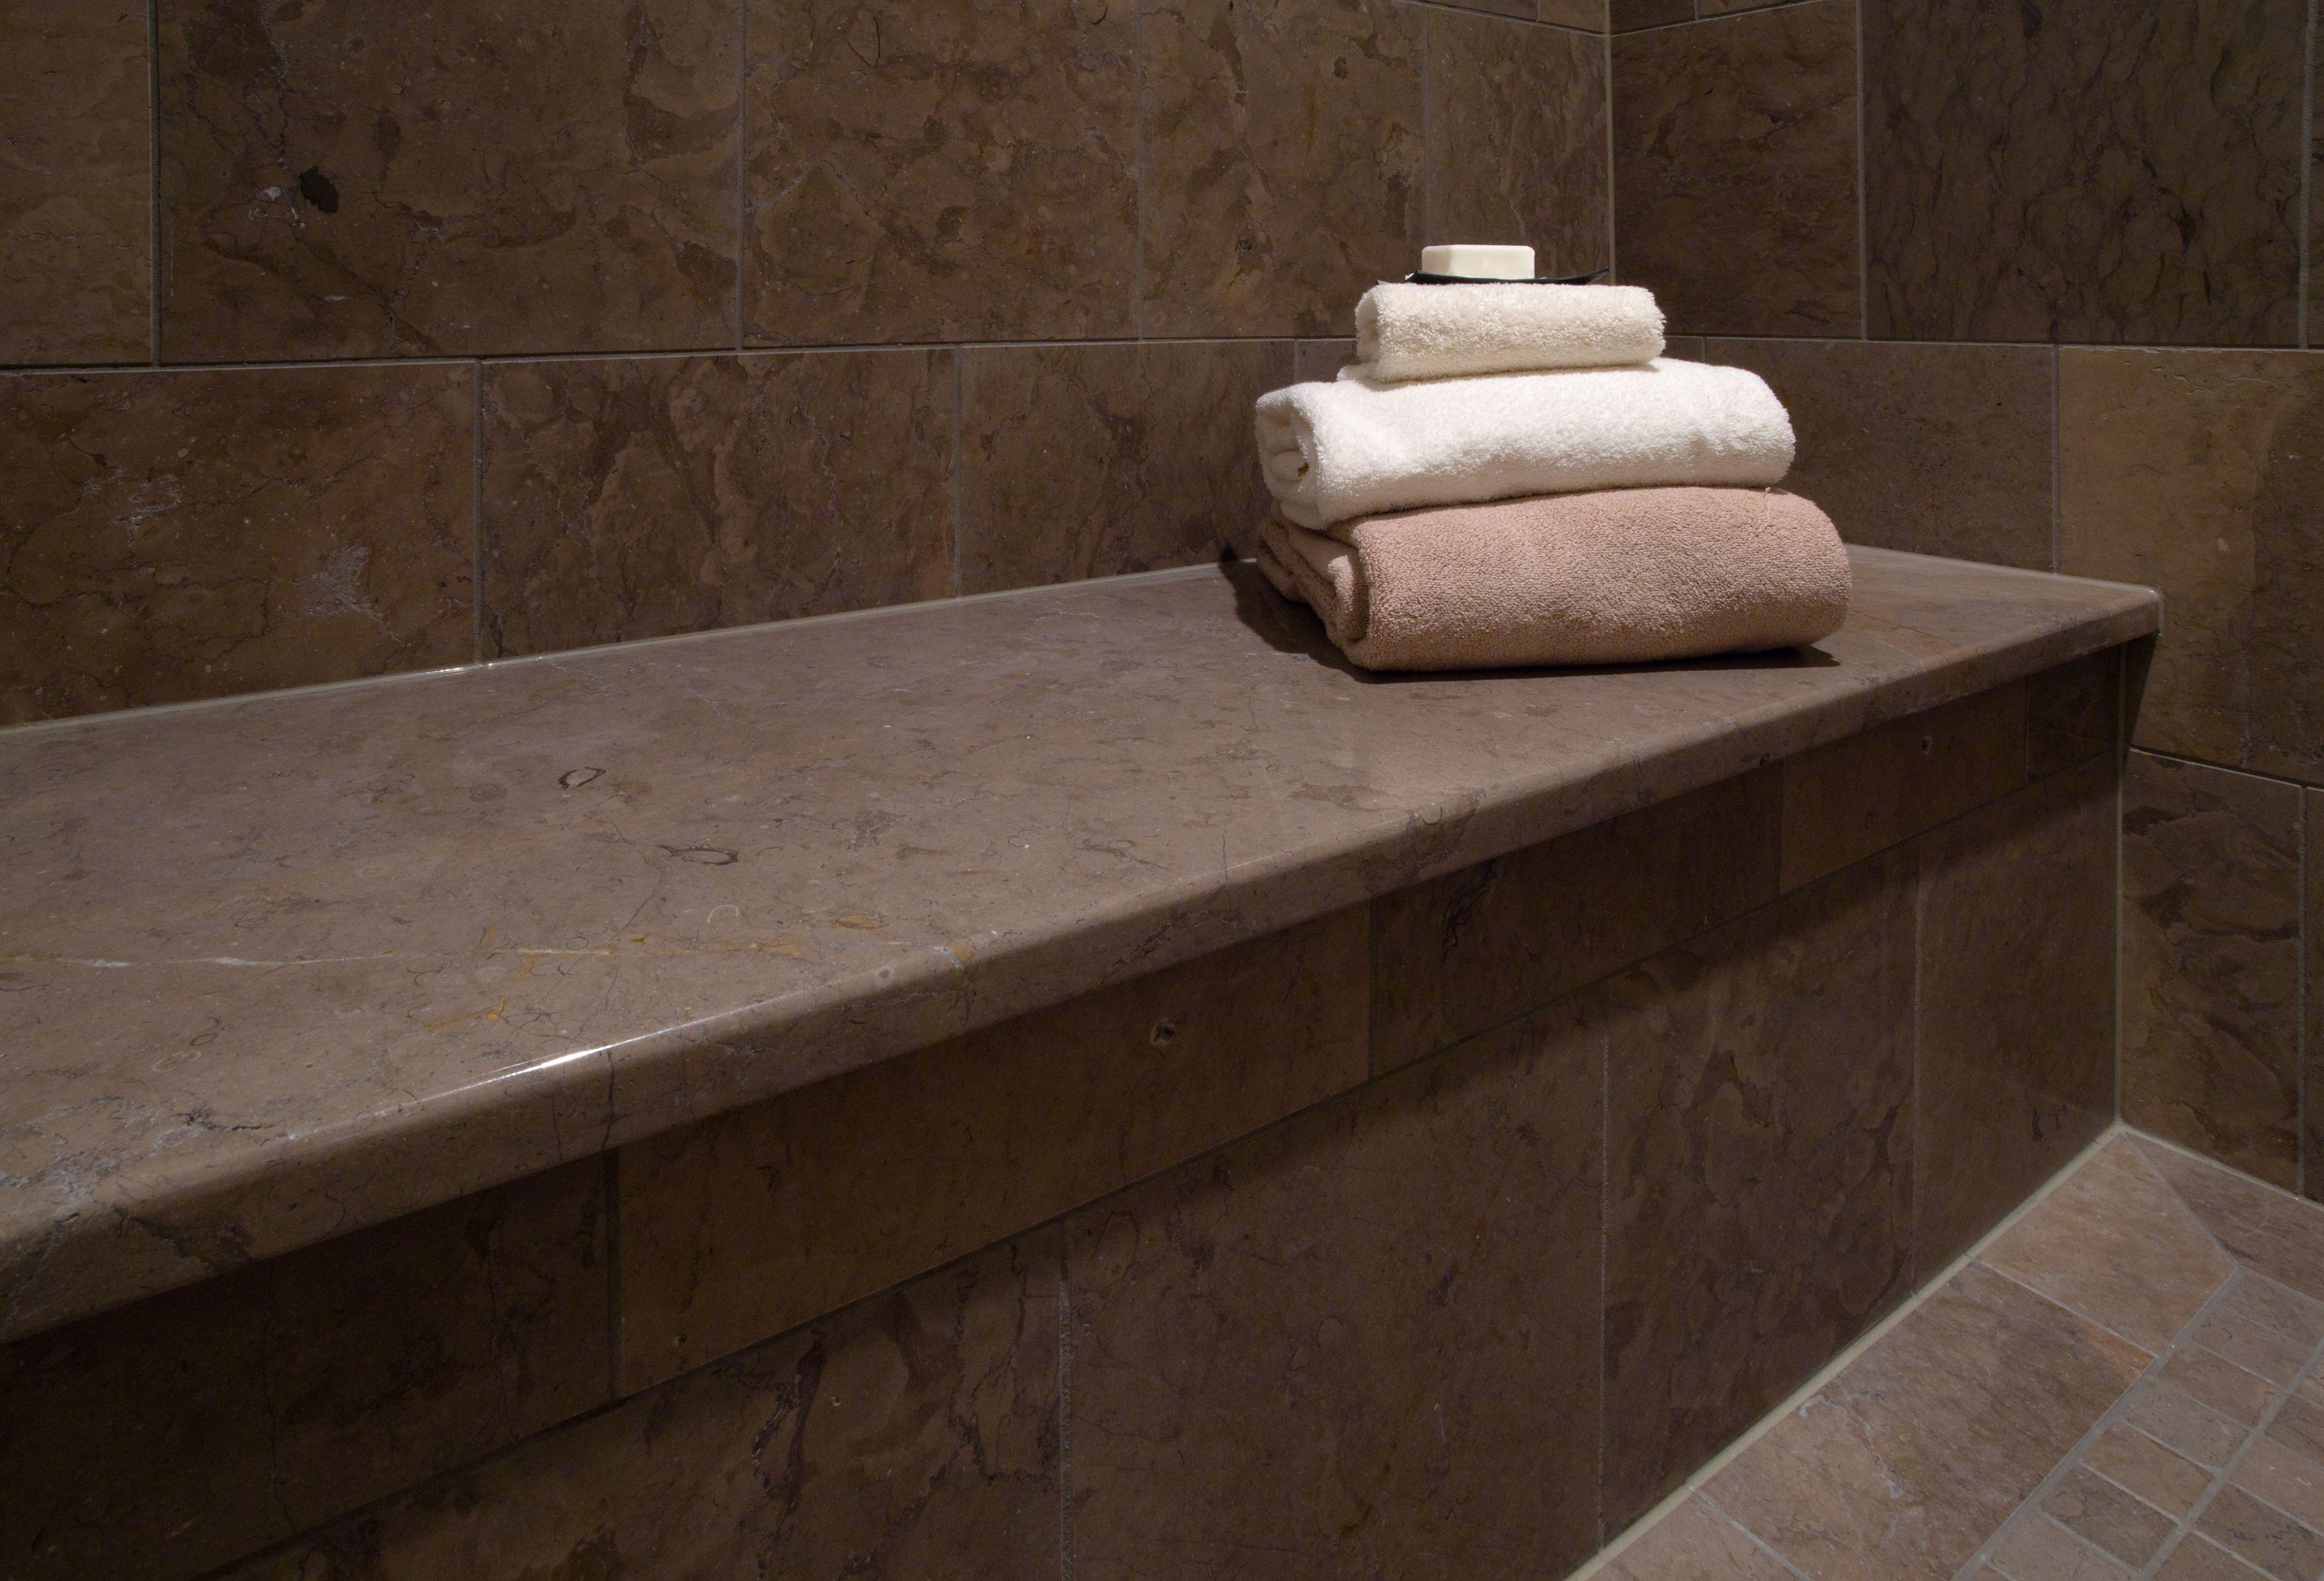 shower chair vs tub bench covers rental nyc corian bathroom dark pinterest